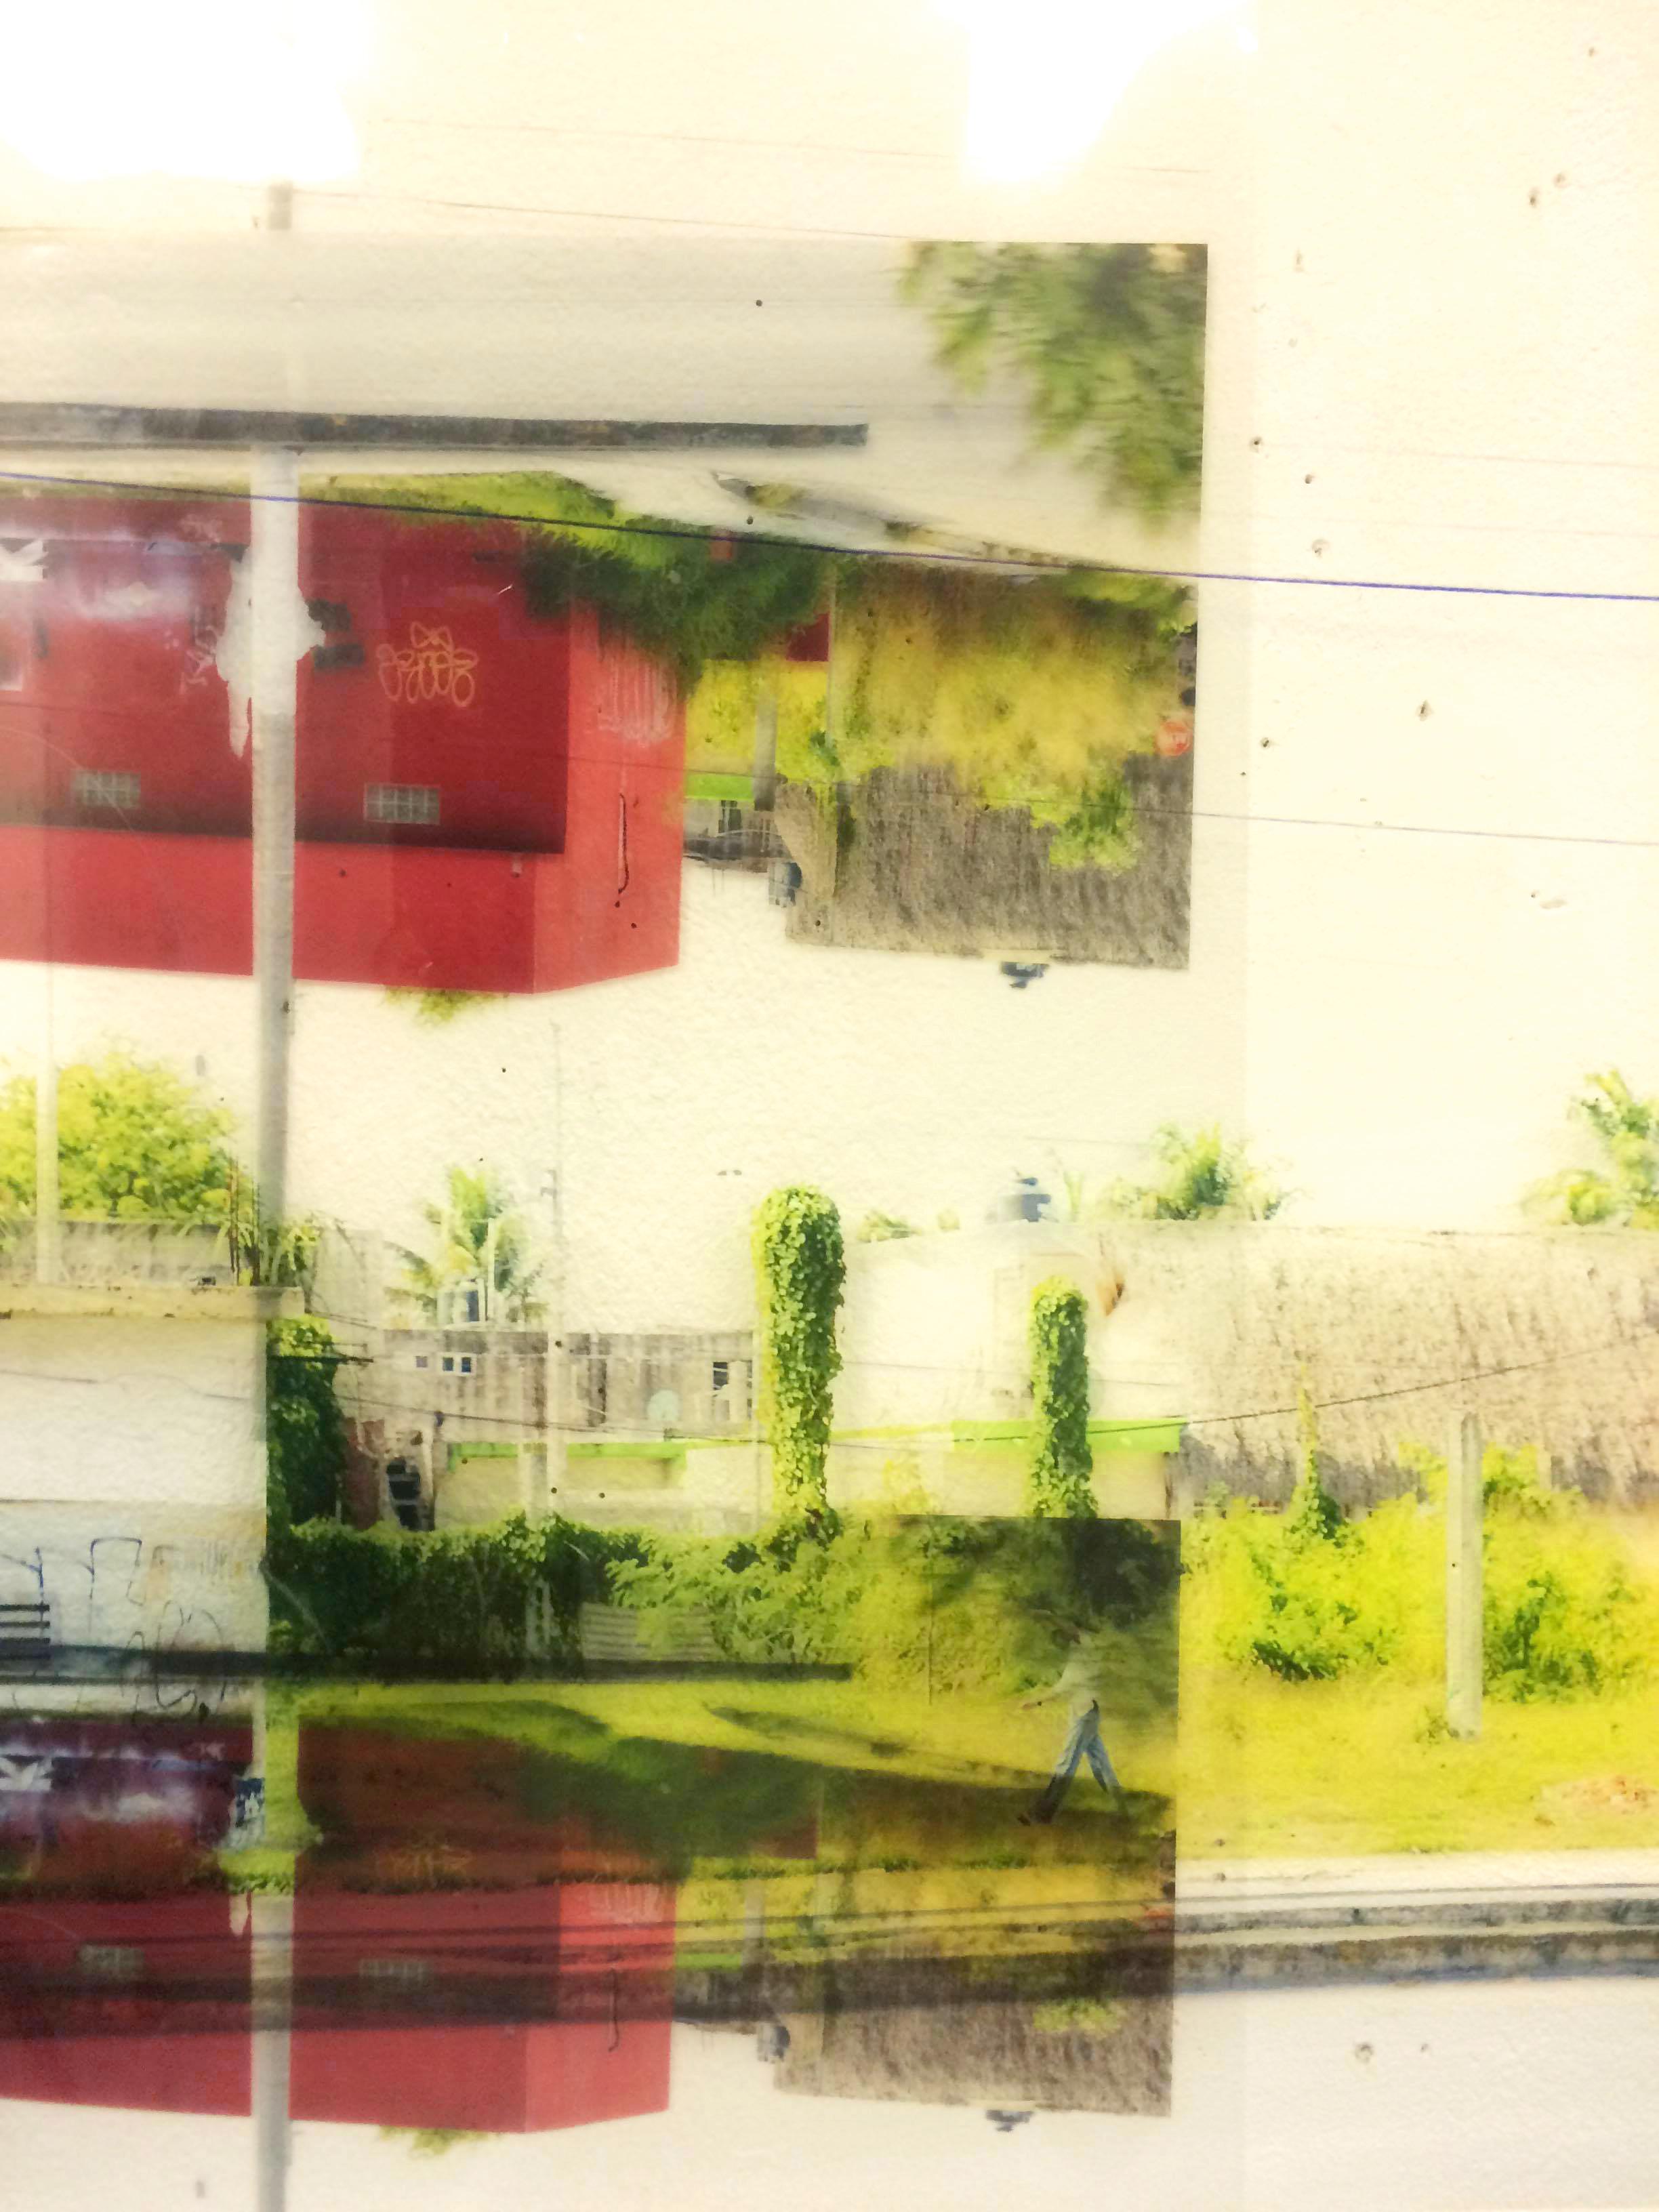 acetate edit2.jpg